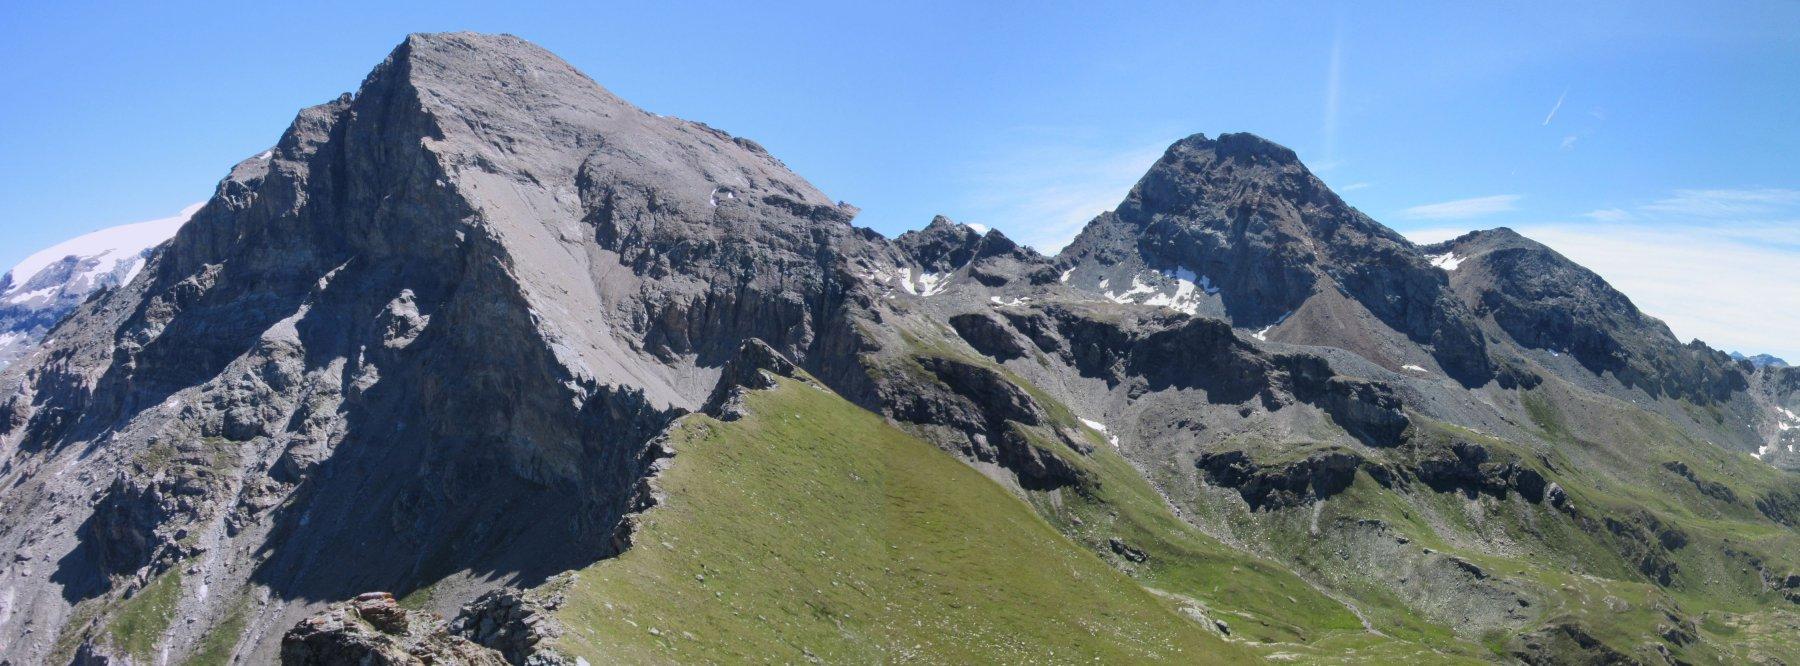 Il Monte Roisetta e i Tournalin